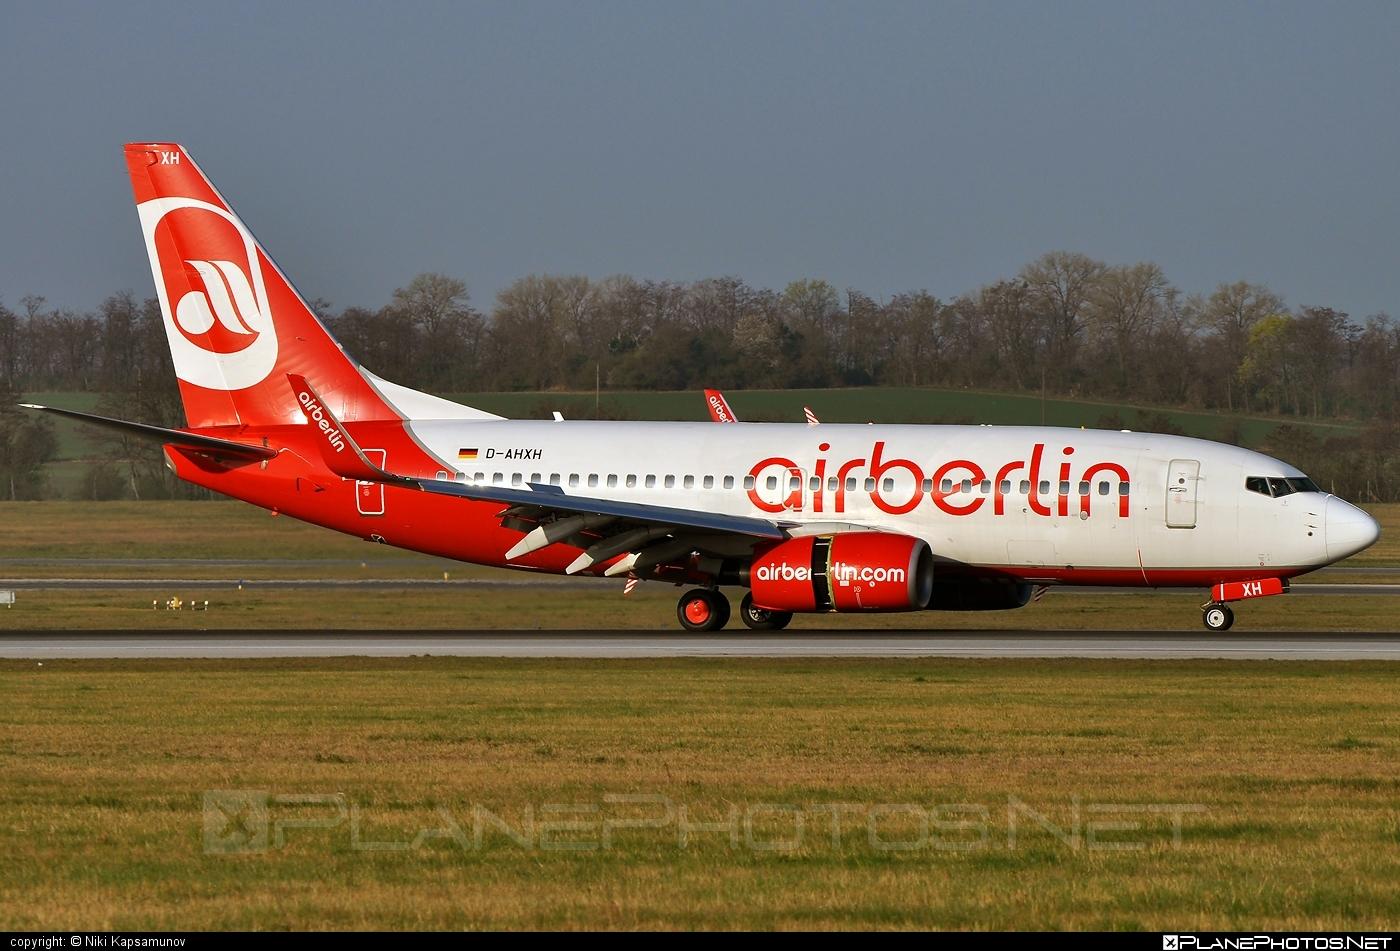 Boeing 737-700 - D-AHXH operated by Air Berlin #airberlin #b737 #b737nextgen #b737ng #boeing #boeing737